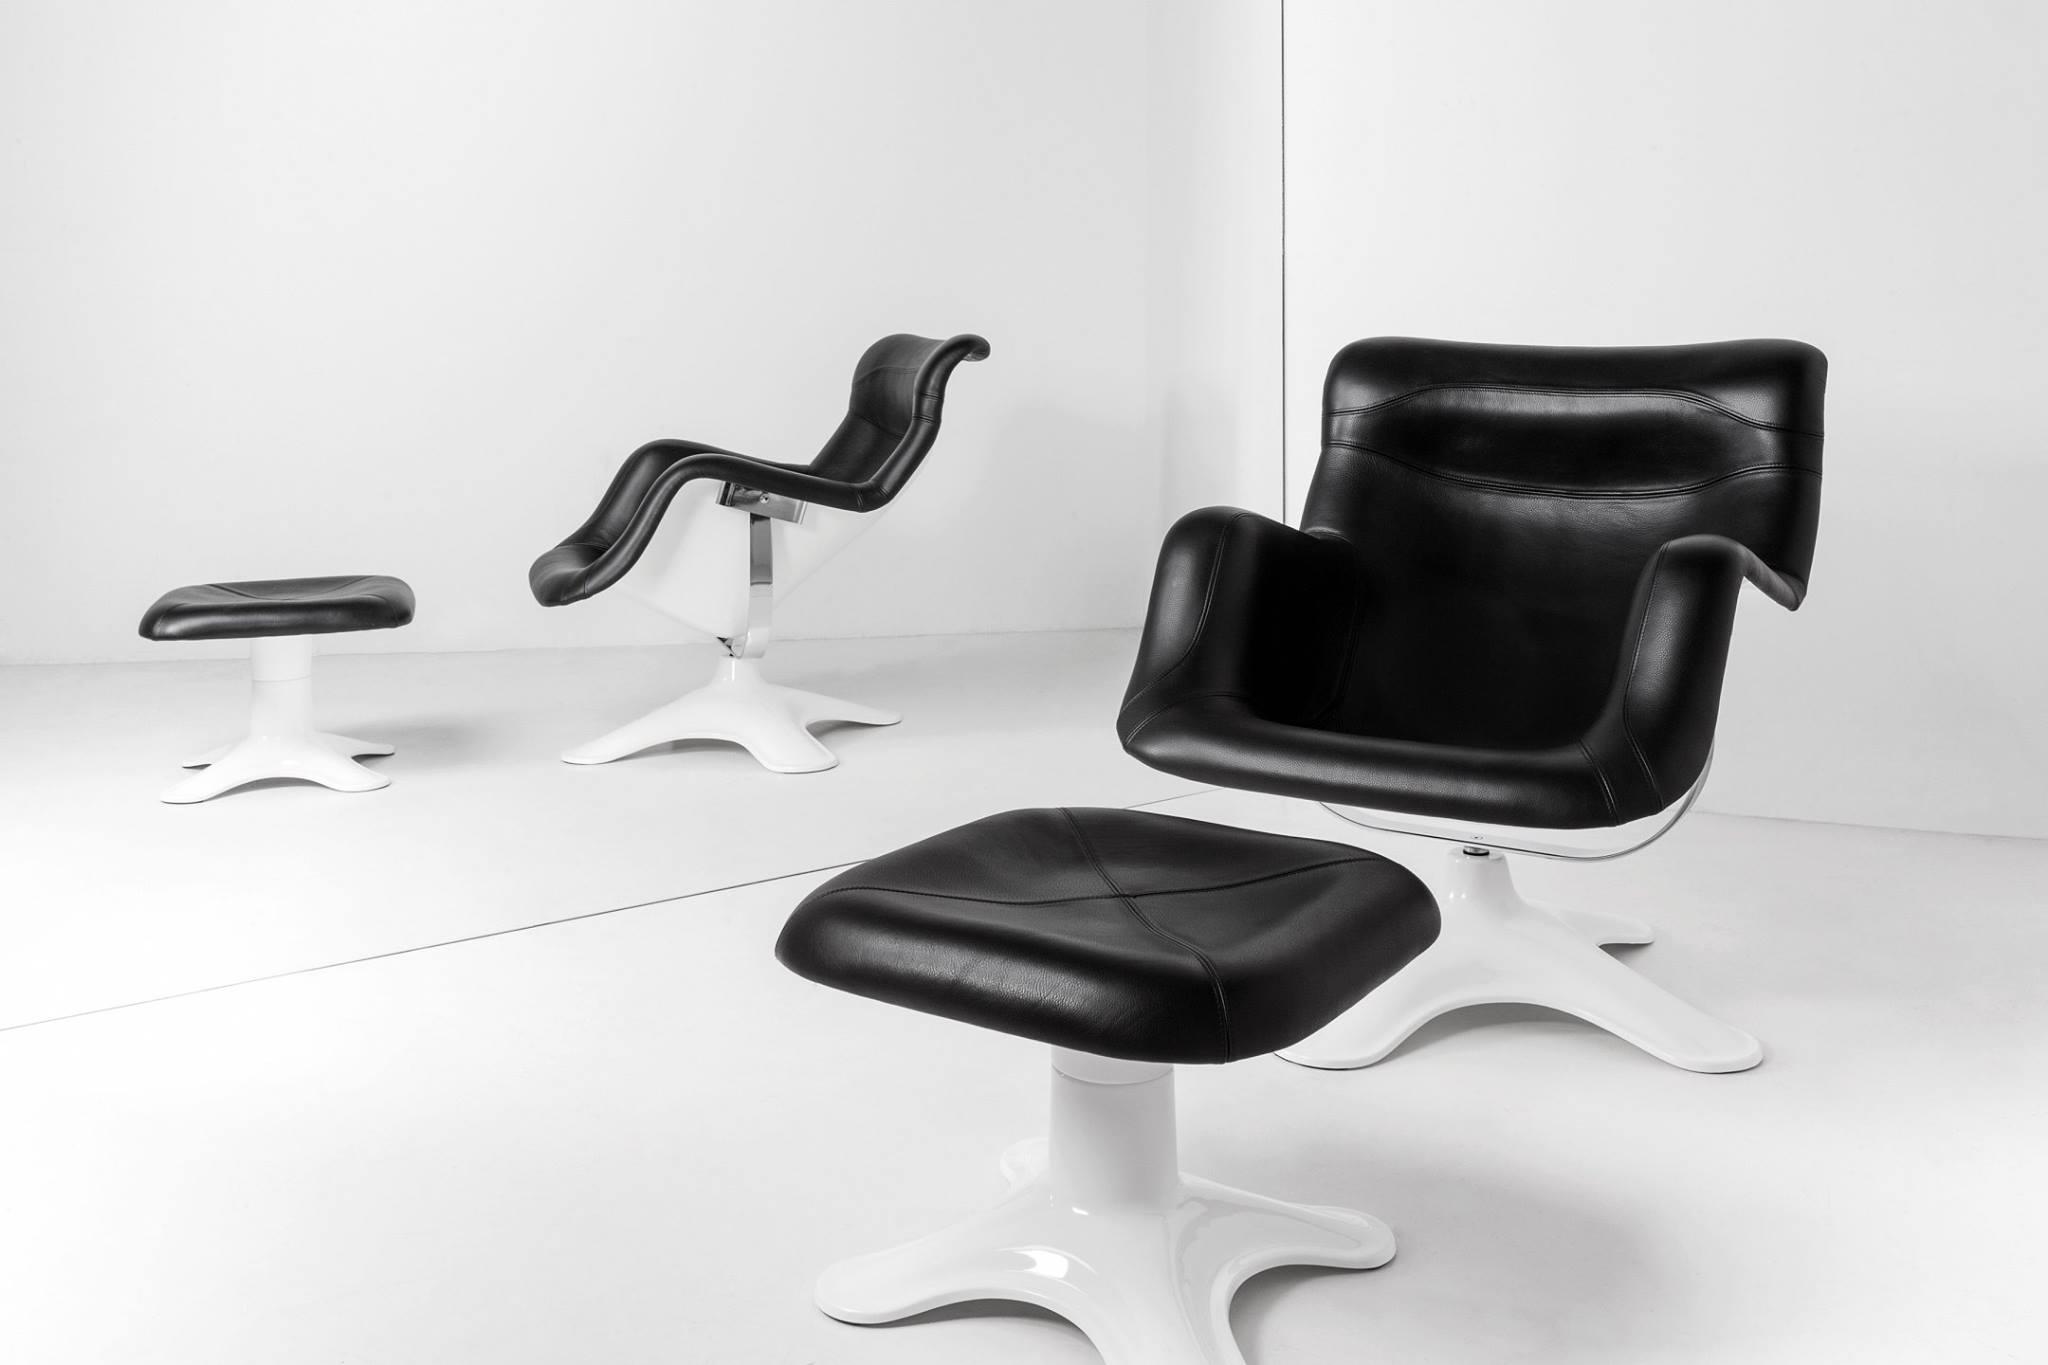 Karuselli Lounge Chair by Yrjo Kukkapuro for Artek, Karuselli Ottoman